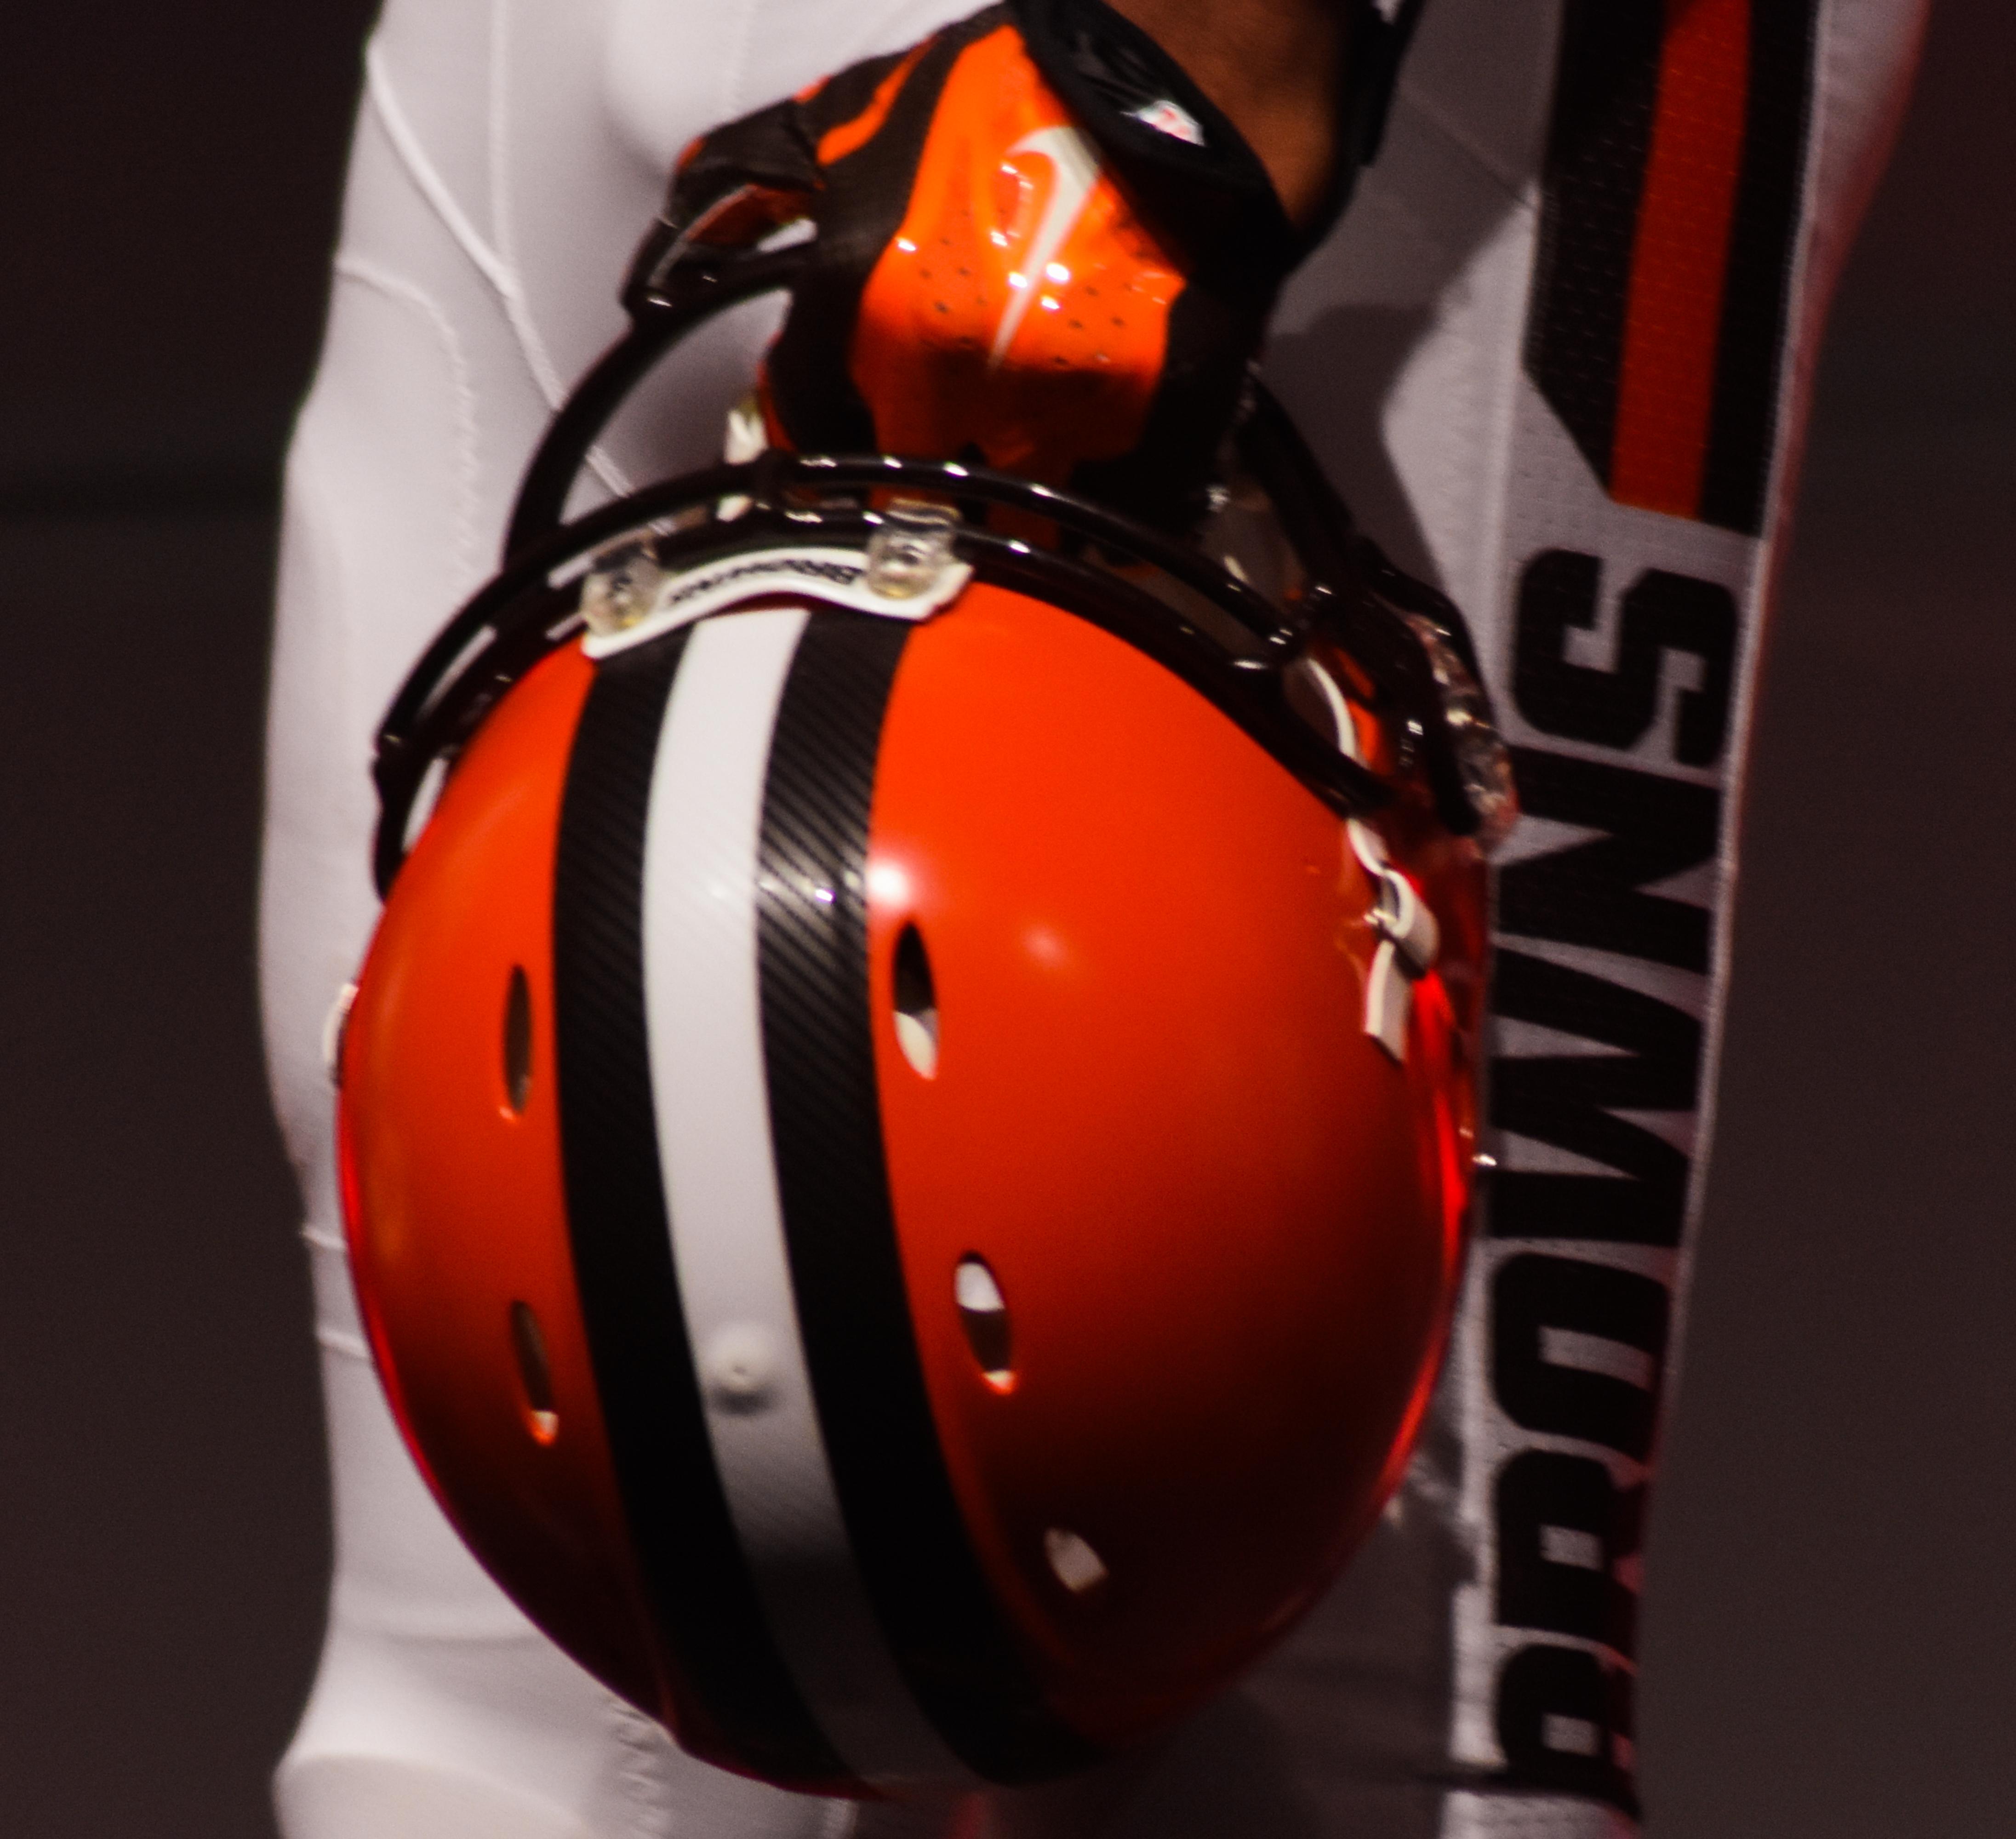 2015 Cleveland Browns season - Wikipedia, the free encyclopedia